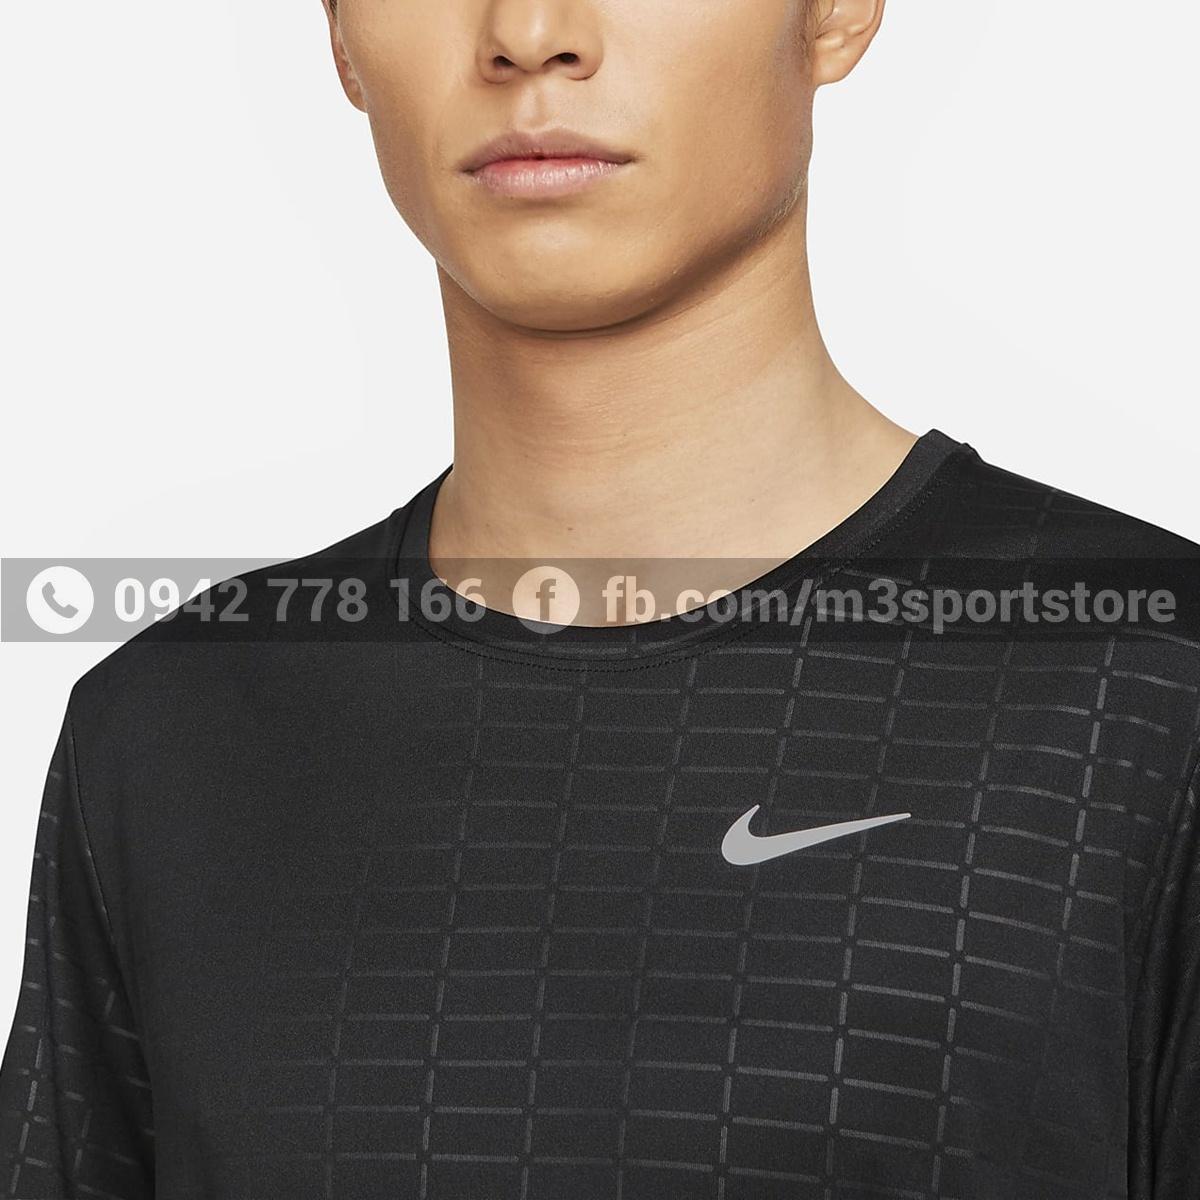 Áo thể thao nam Nike Miler Run Division DA1318